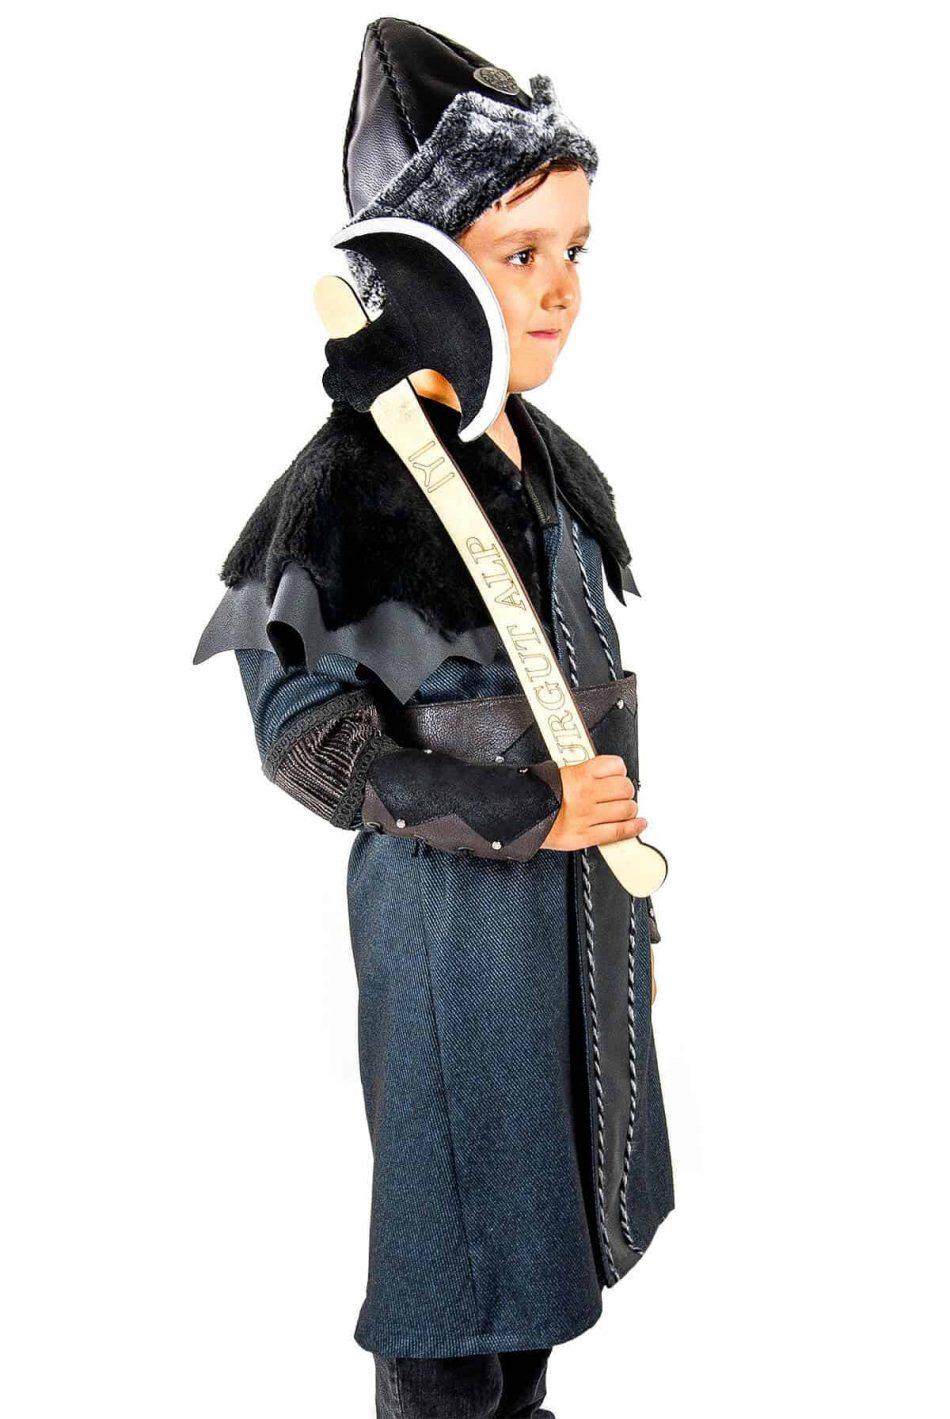 Resurrection Ertugrul Alp Costume DC 106 03 3 950x1419 - Resurrection Ertugrul Alp Costume